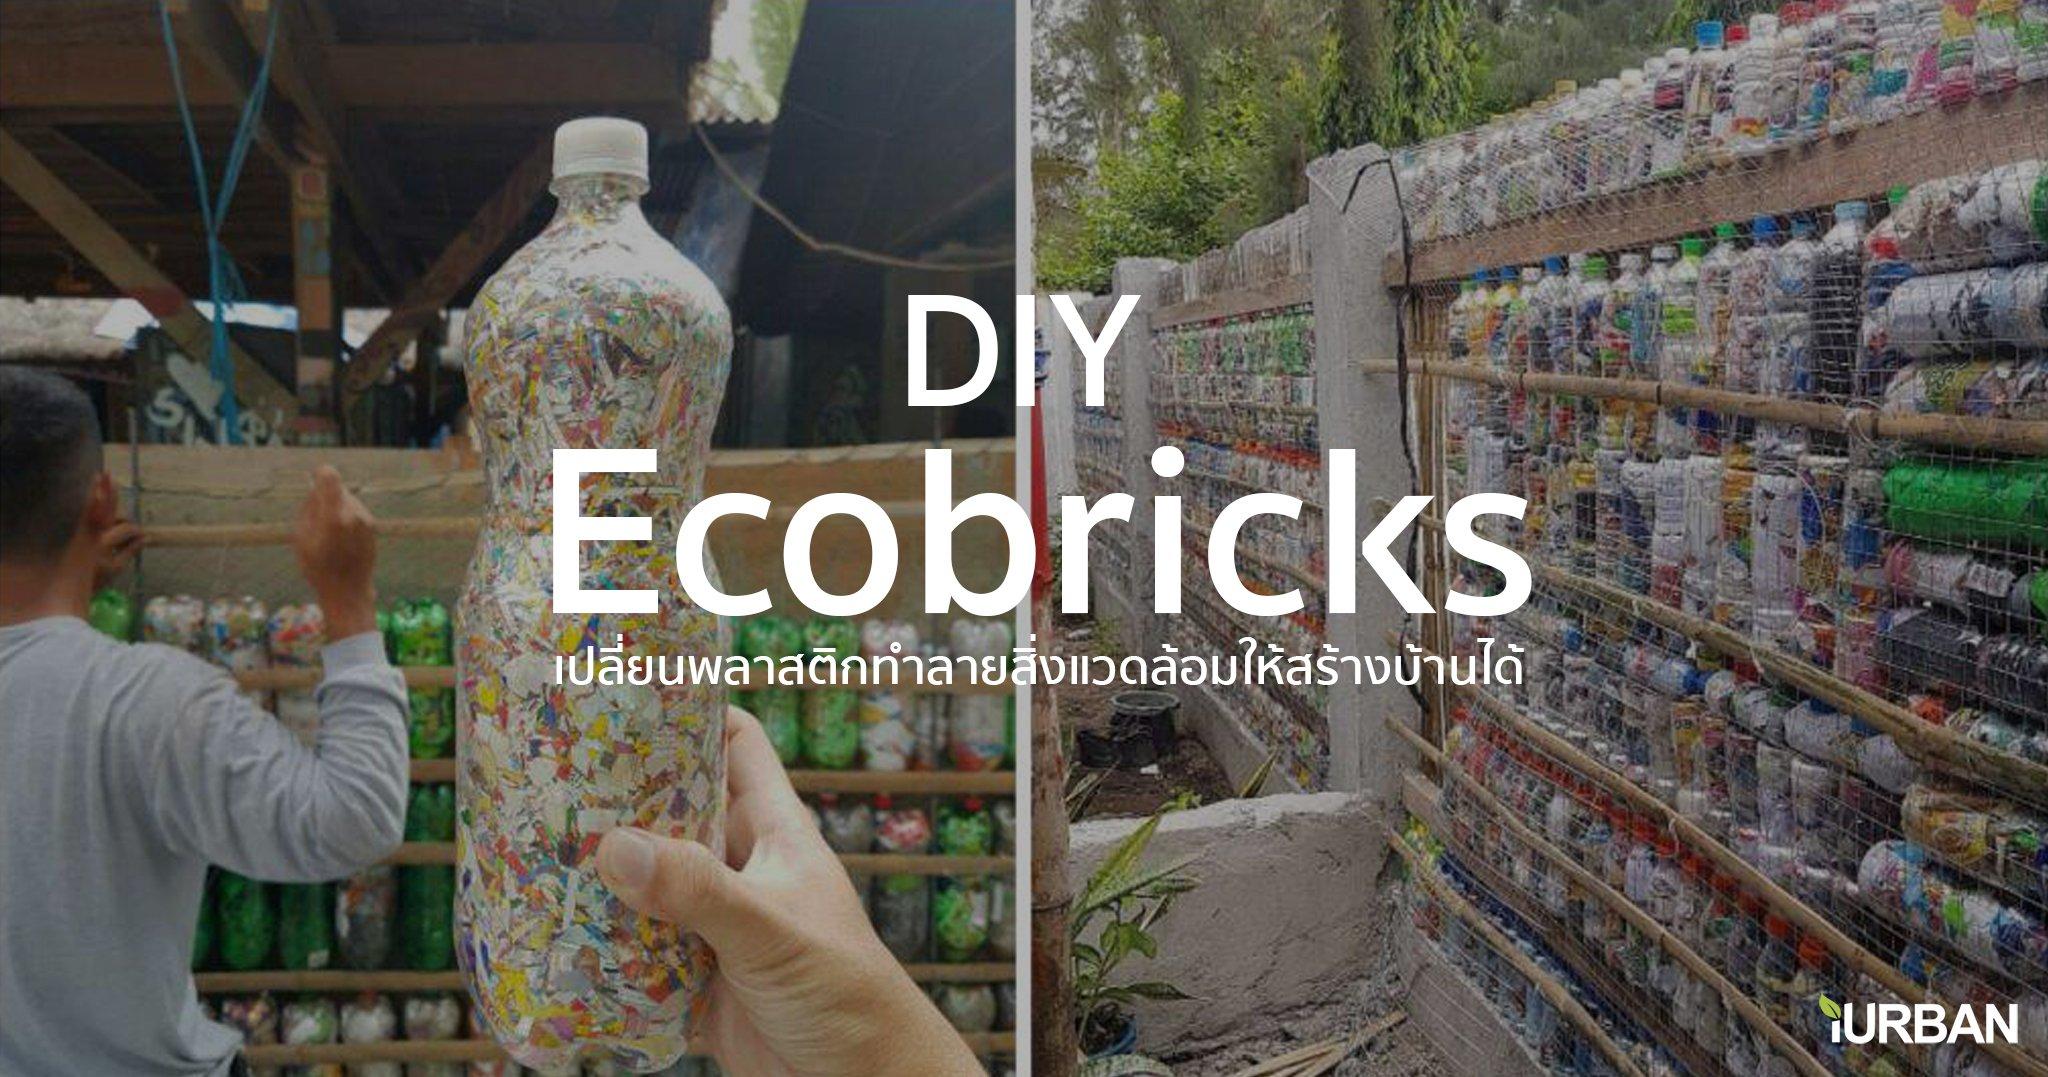 D.I.Y Ecobricks เมื่อขวดน้ำพลาสติกเป็นได้มากกว่าที่คิด 2 - DIY